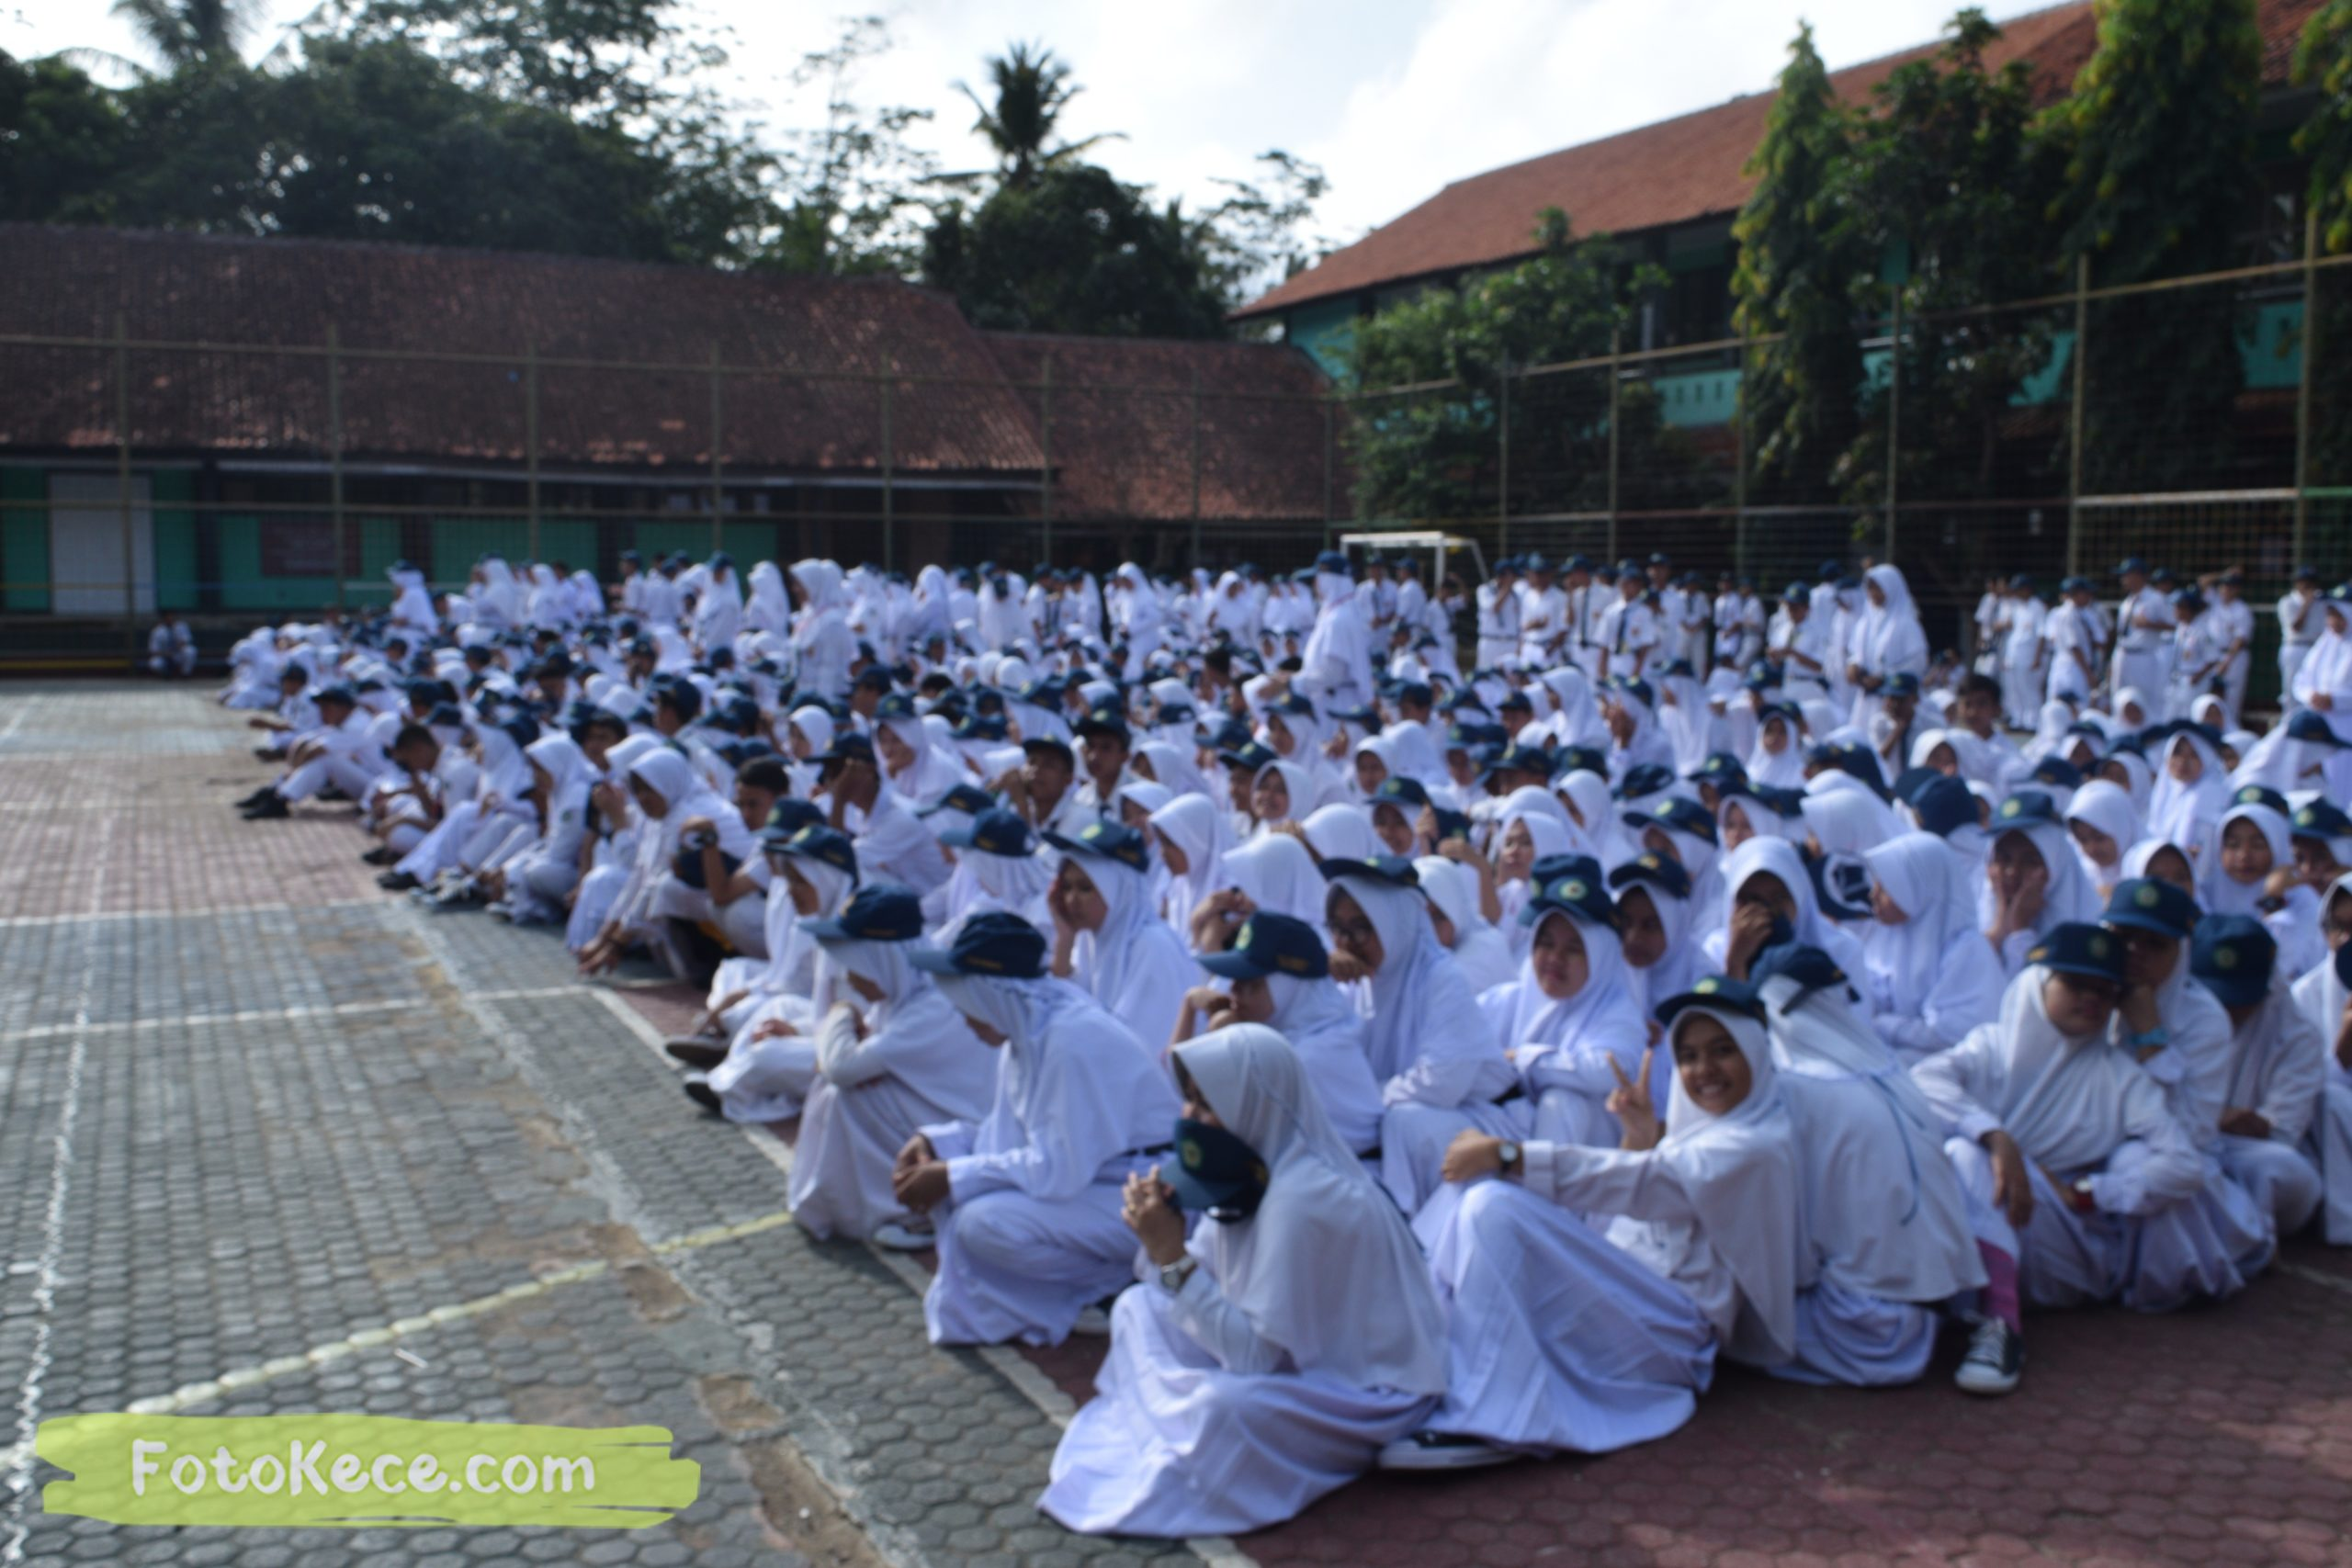 deklarasi pelajar tolak intoleransi diksriminasi radikalisme lawan hoax dan ujaran kebencian 1 32 scaled